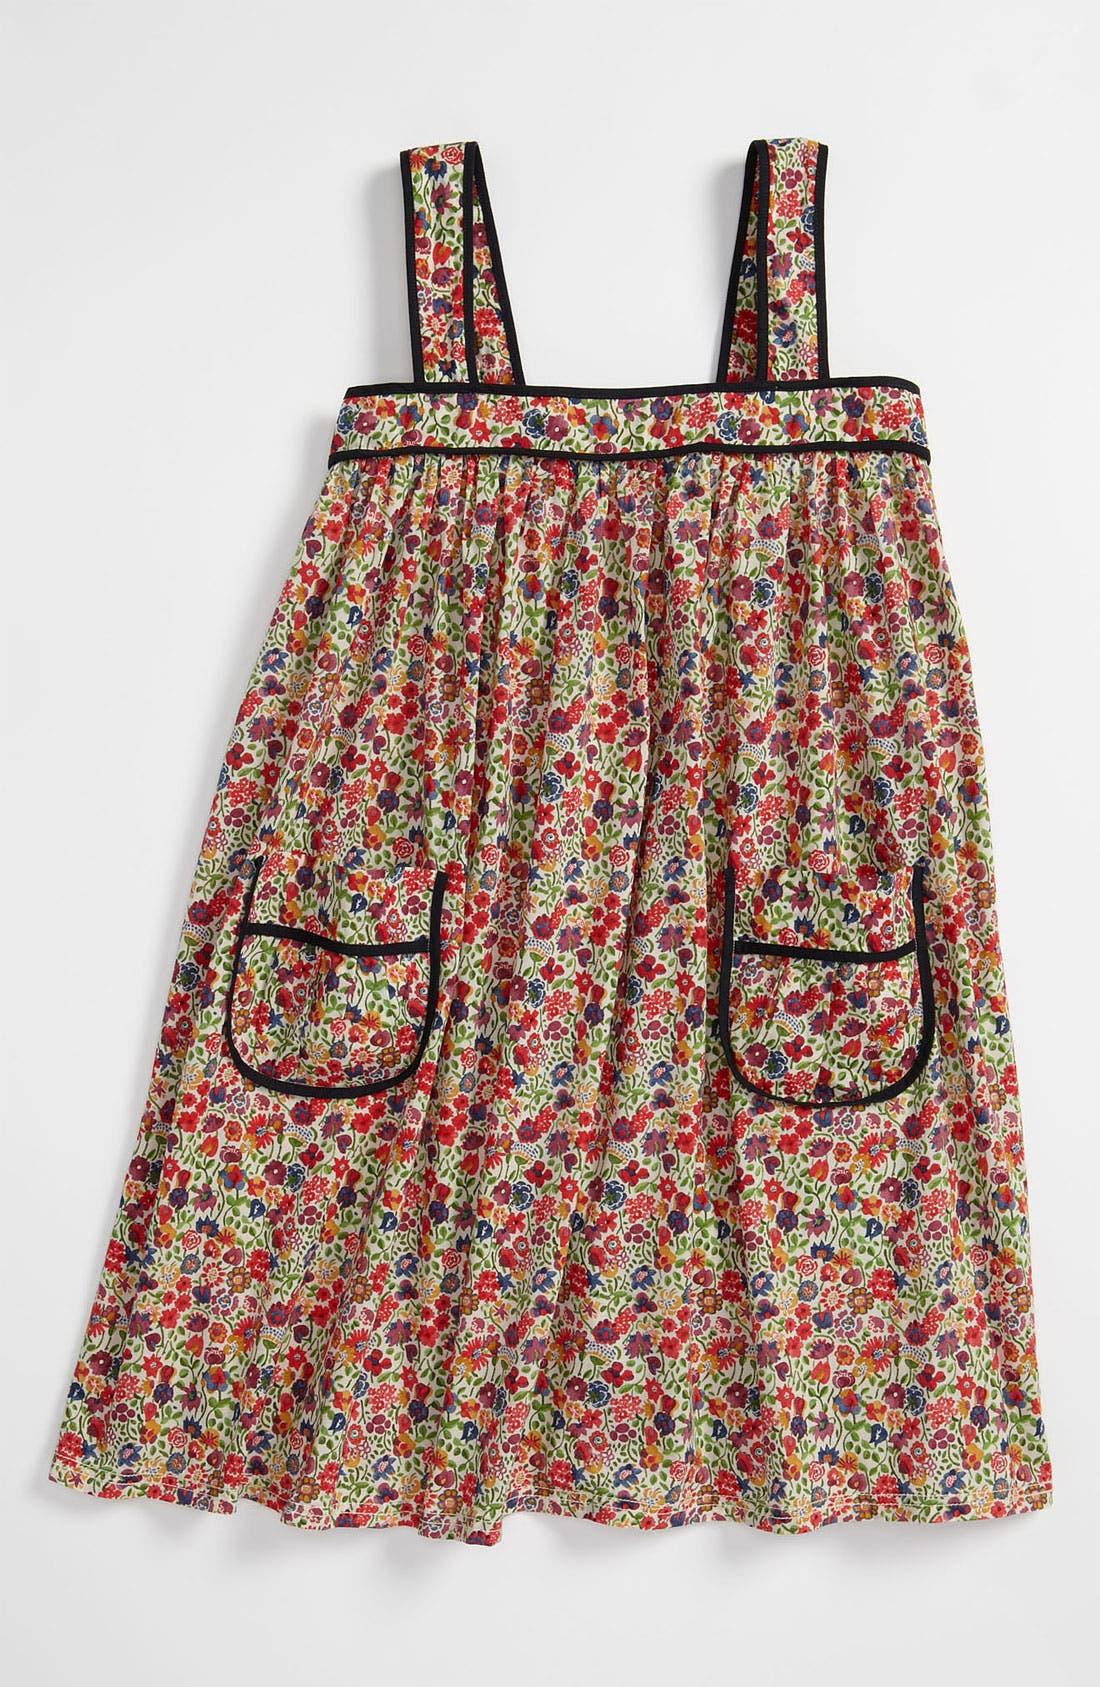 Alternate Image 1 Selected - Peek 'Julia' Dress (Toddler, Little Girls & Big Girls)